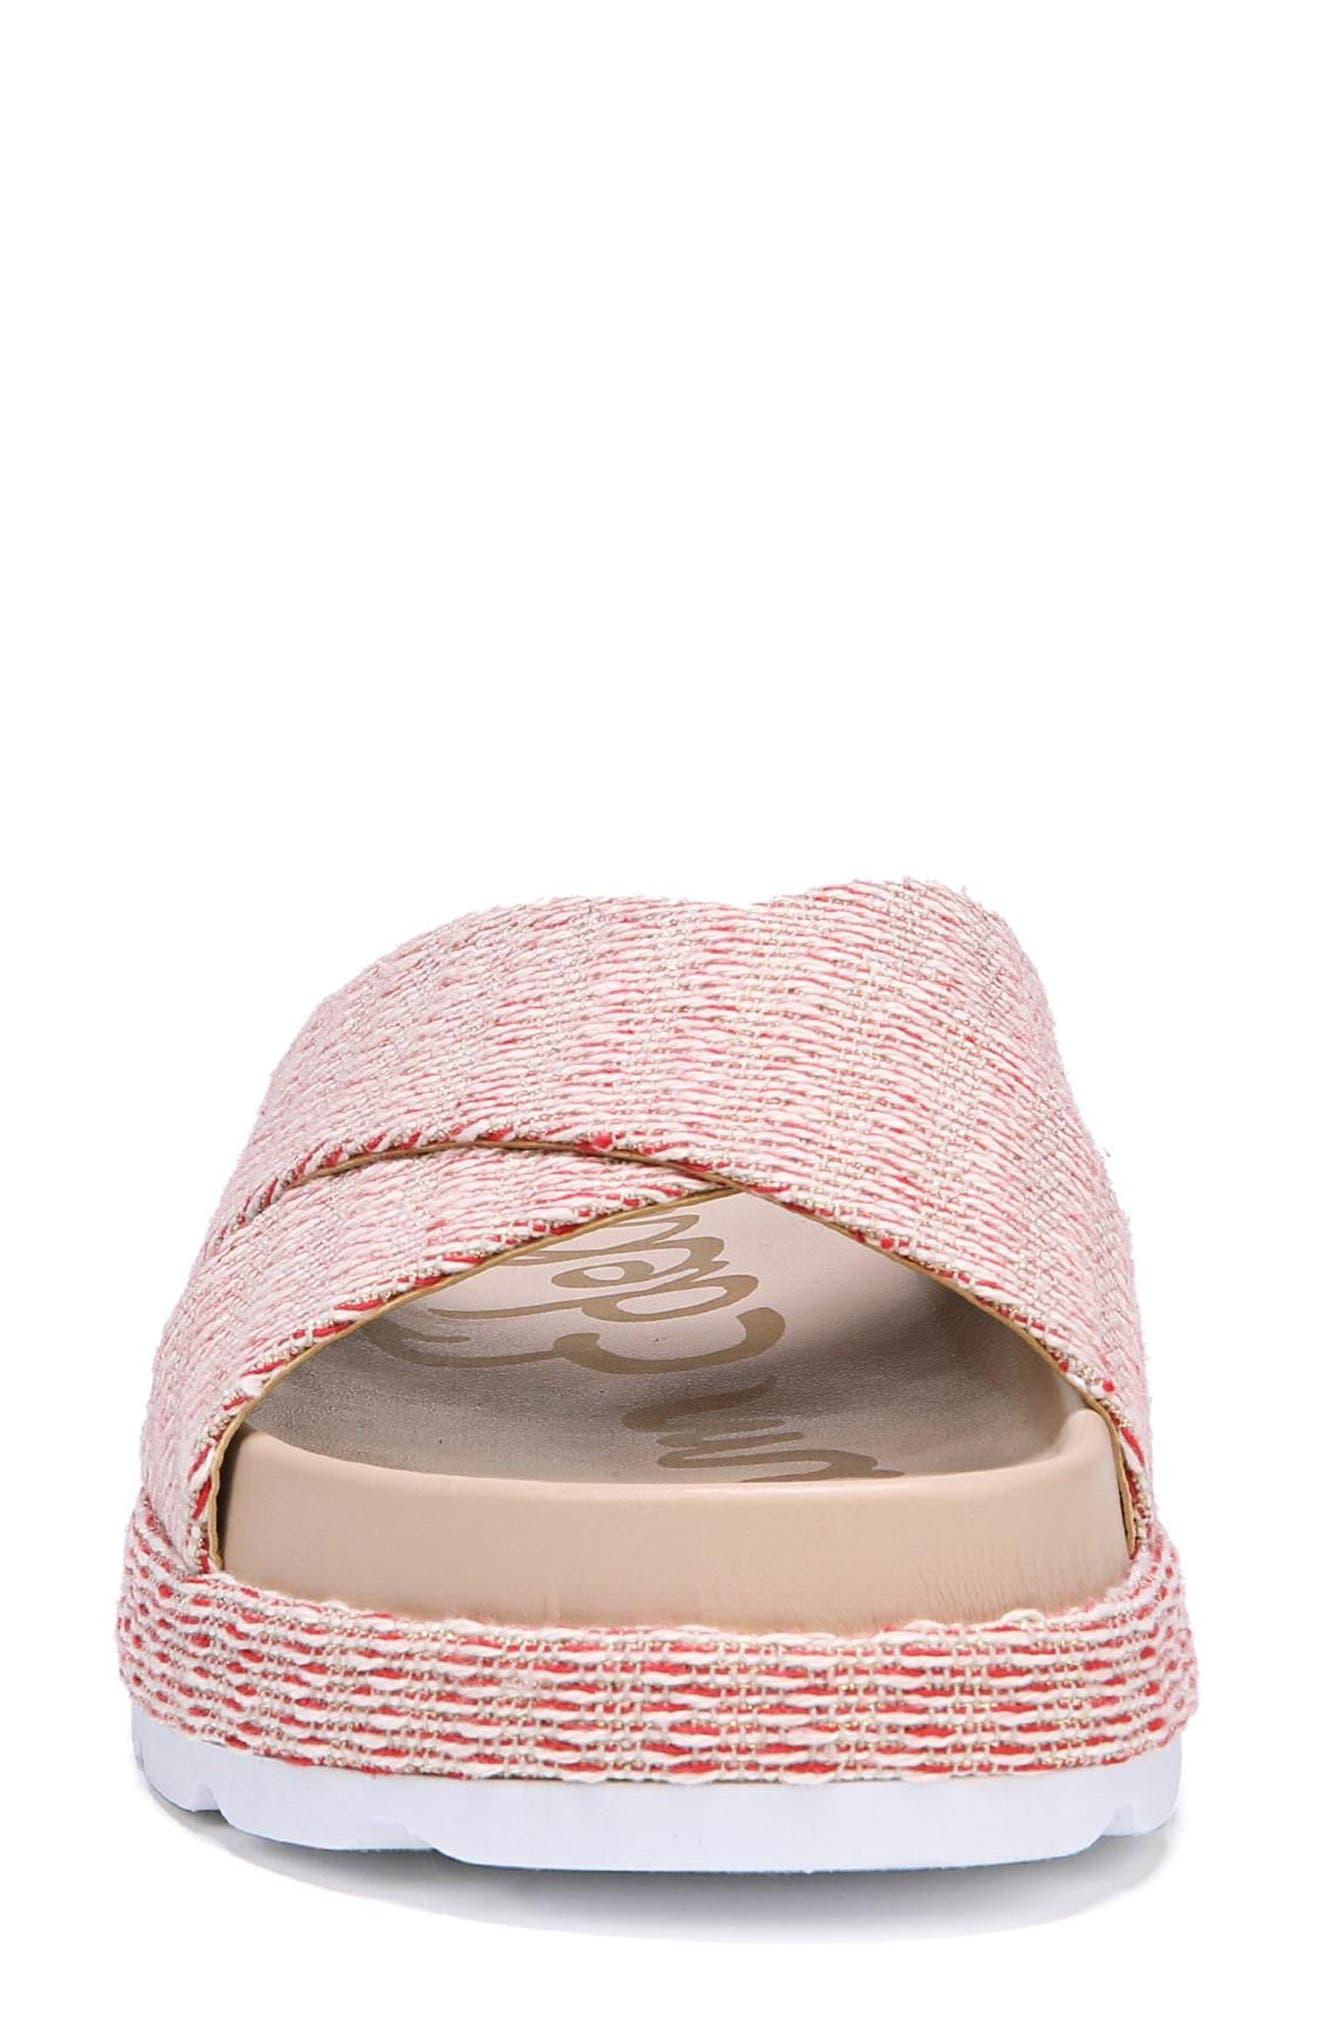 Sadia Slide Sandal,                             Alternate thumbnail 4, color,                             Candy Red Stripe Print Fabric